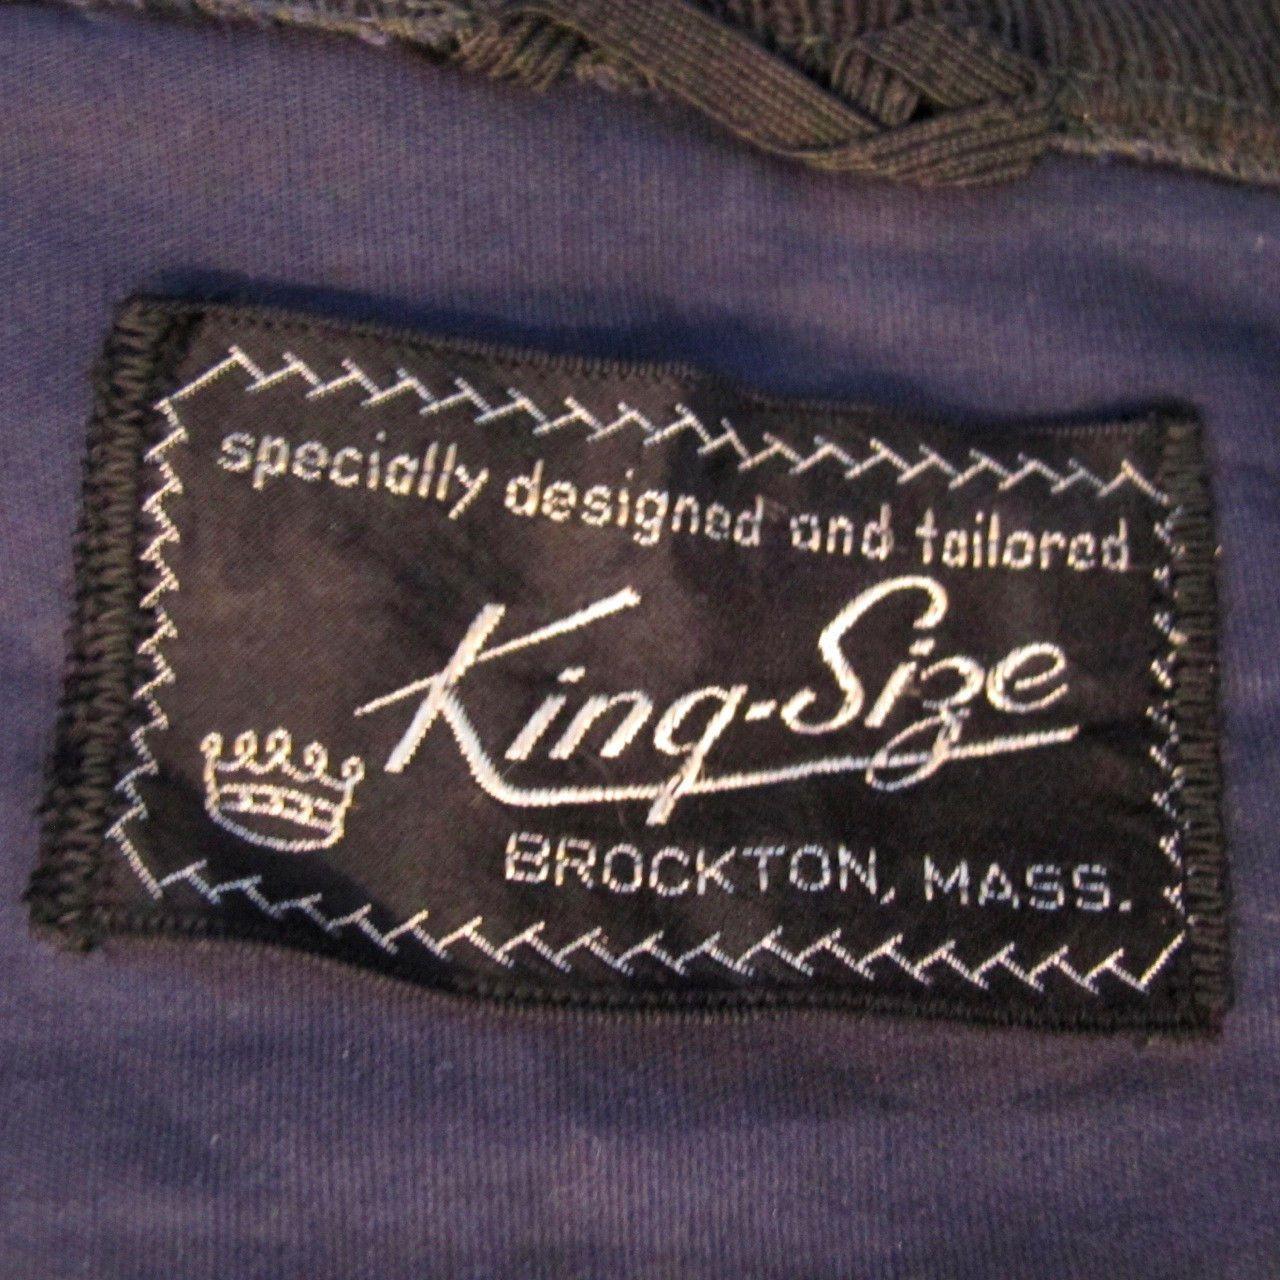 9c033bb13 VINTAGE ORIGINAL KING SIZE JACKET BROCKTON MASS 1950's BLUE XL ...